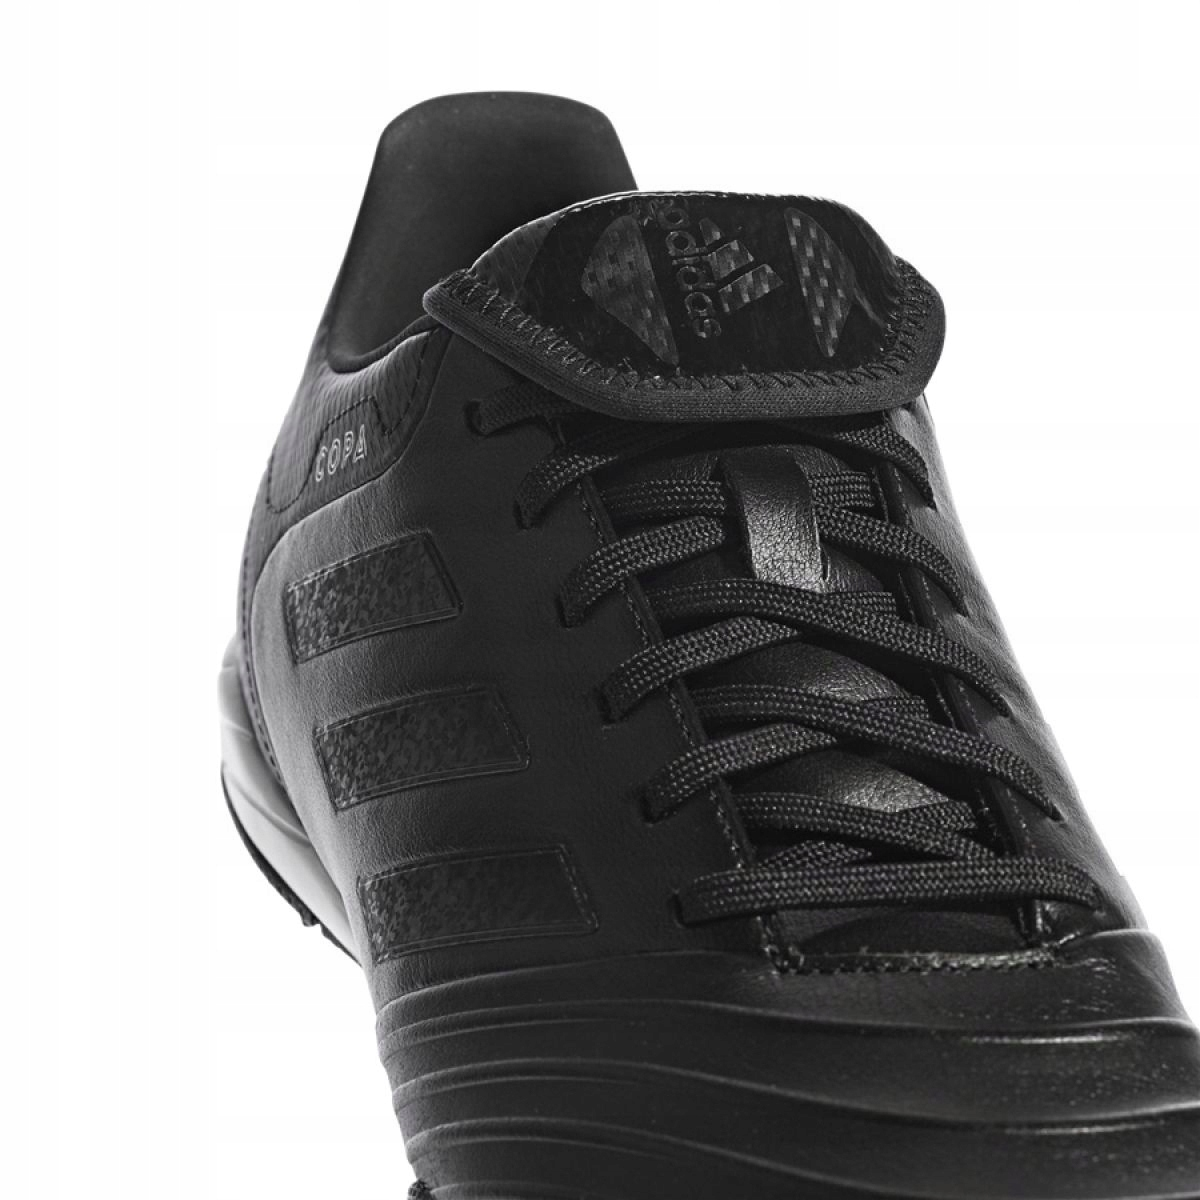 san francisco 2f6eb 20c3b Buty adidas Copa Tango 18.3 TF DB2414 43 13 (7472832652)